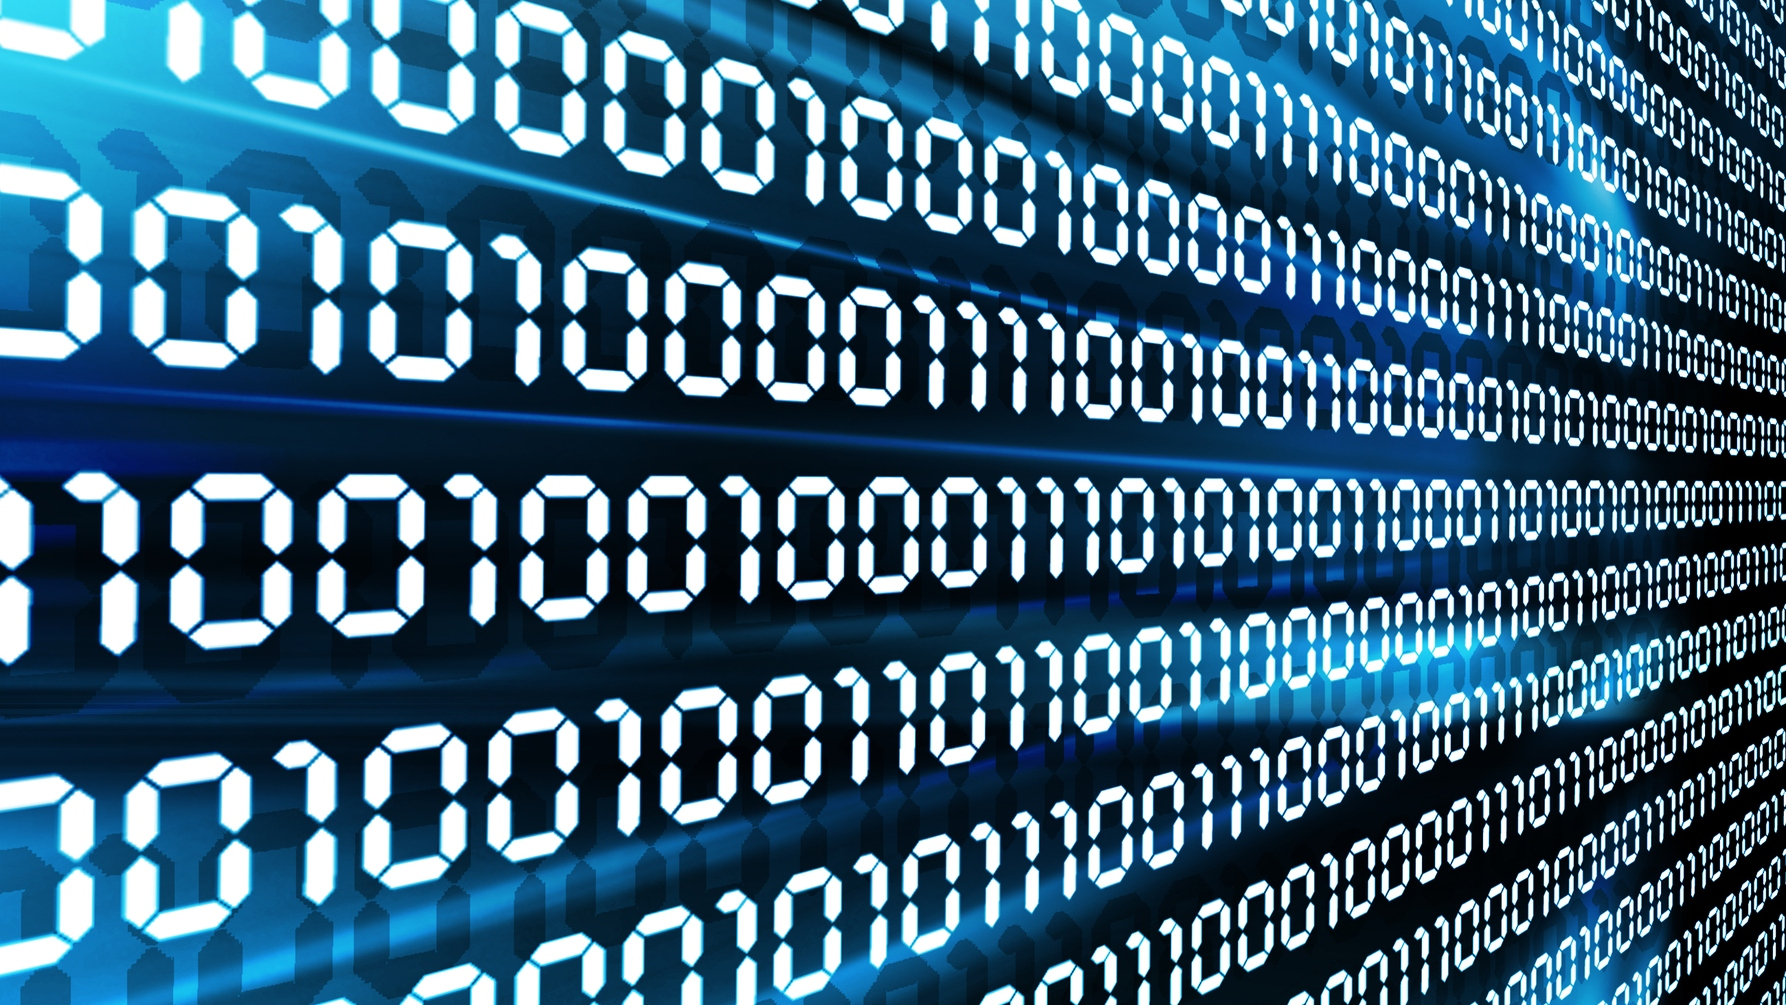 innowacje, technologia, blockchain